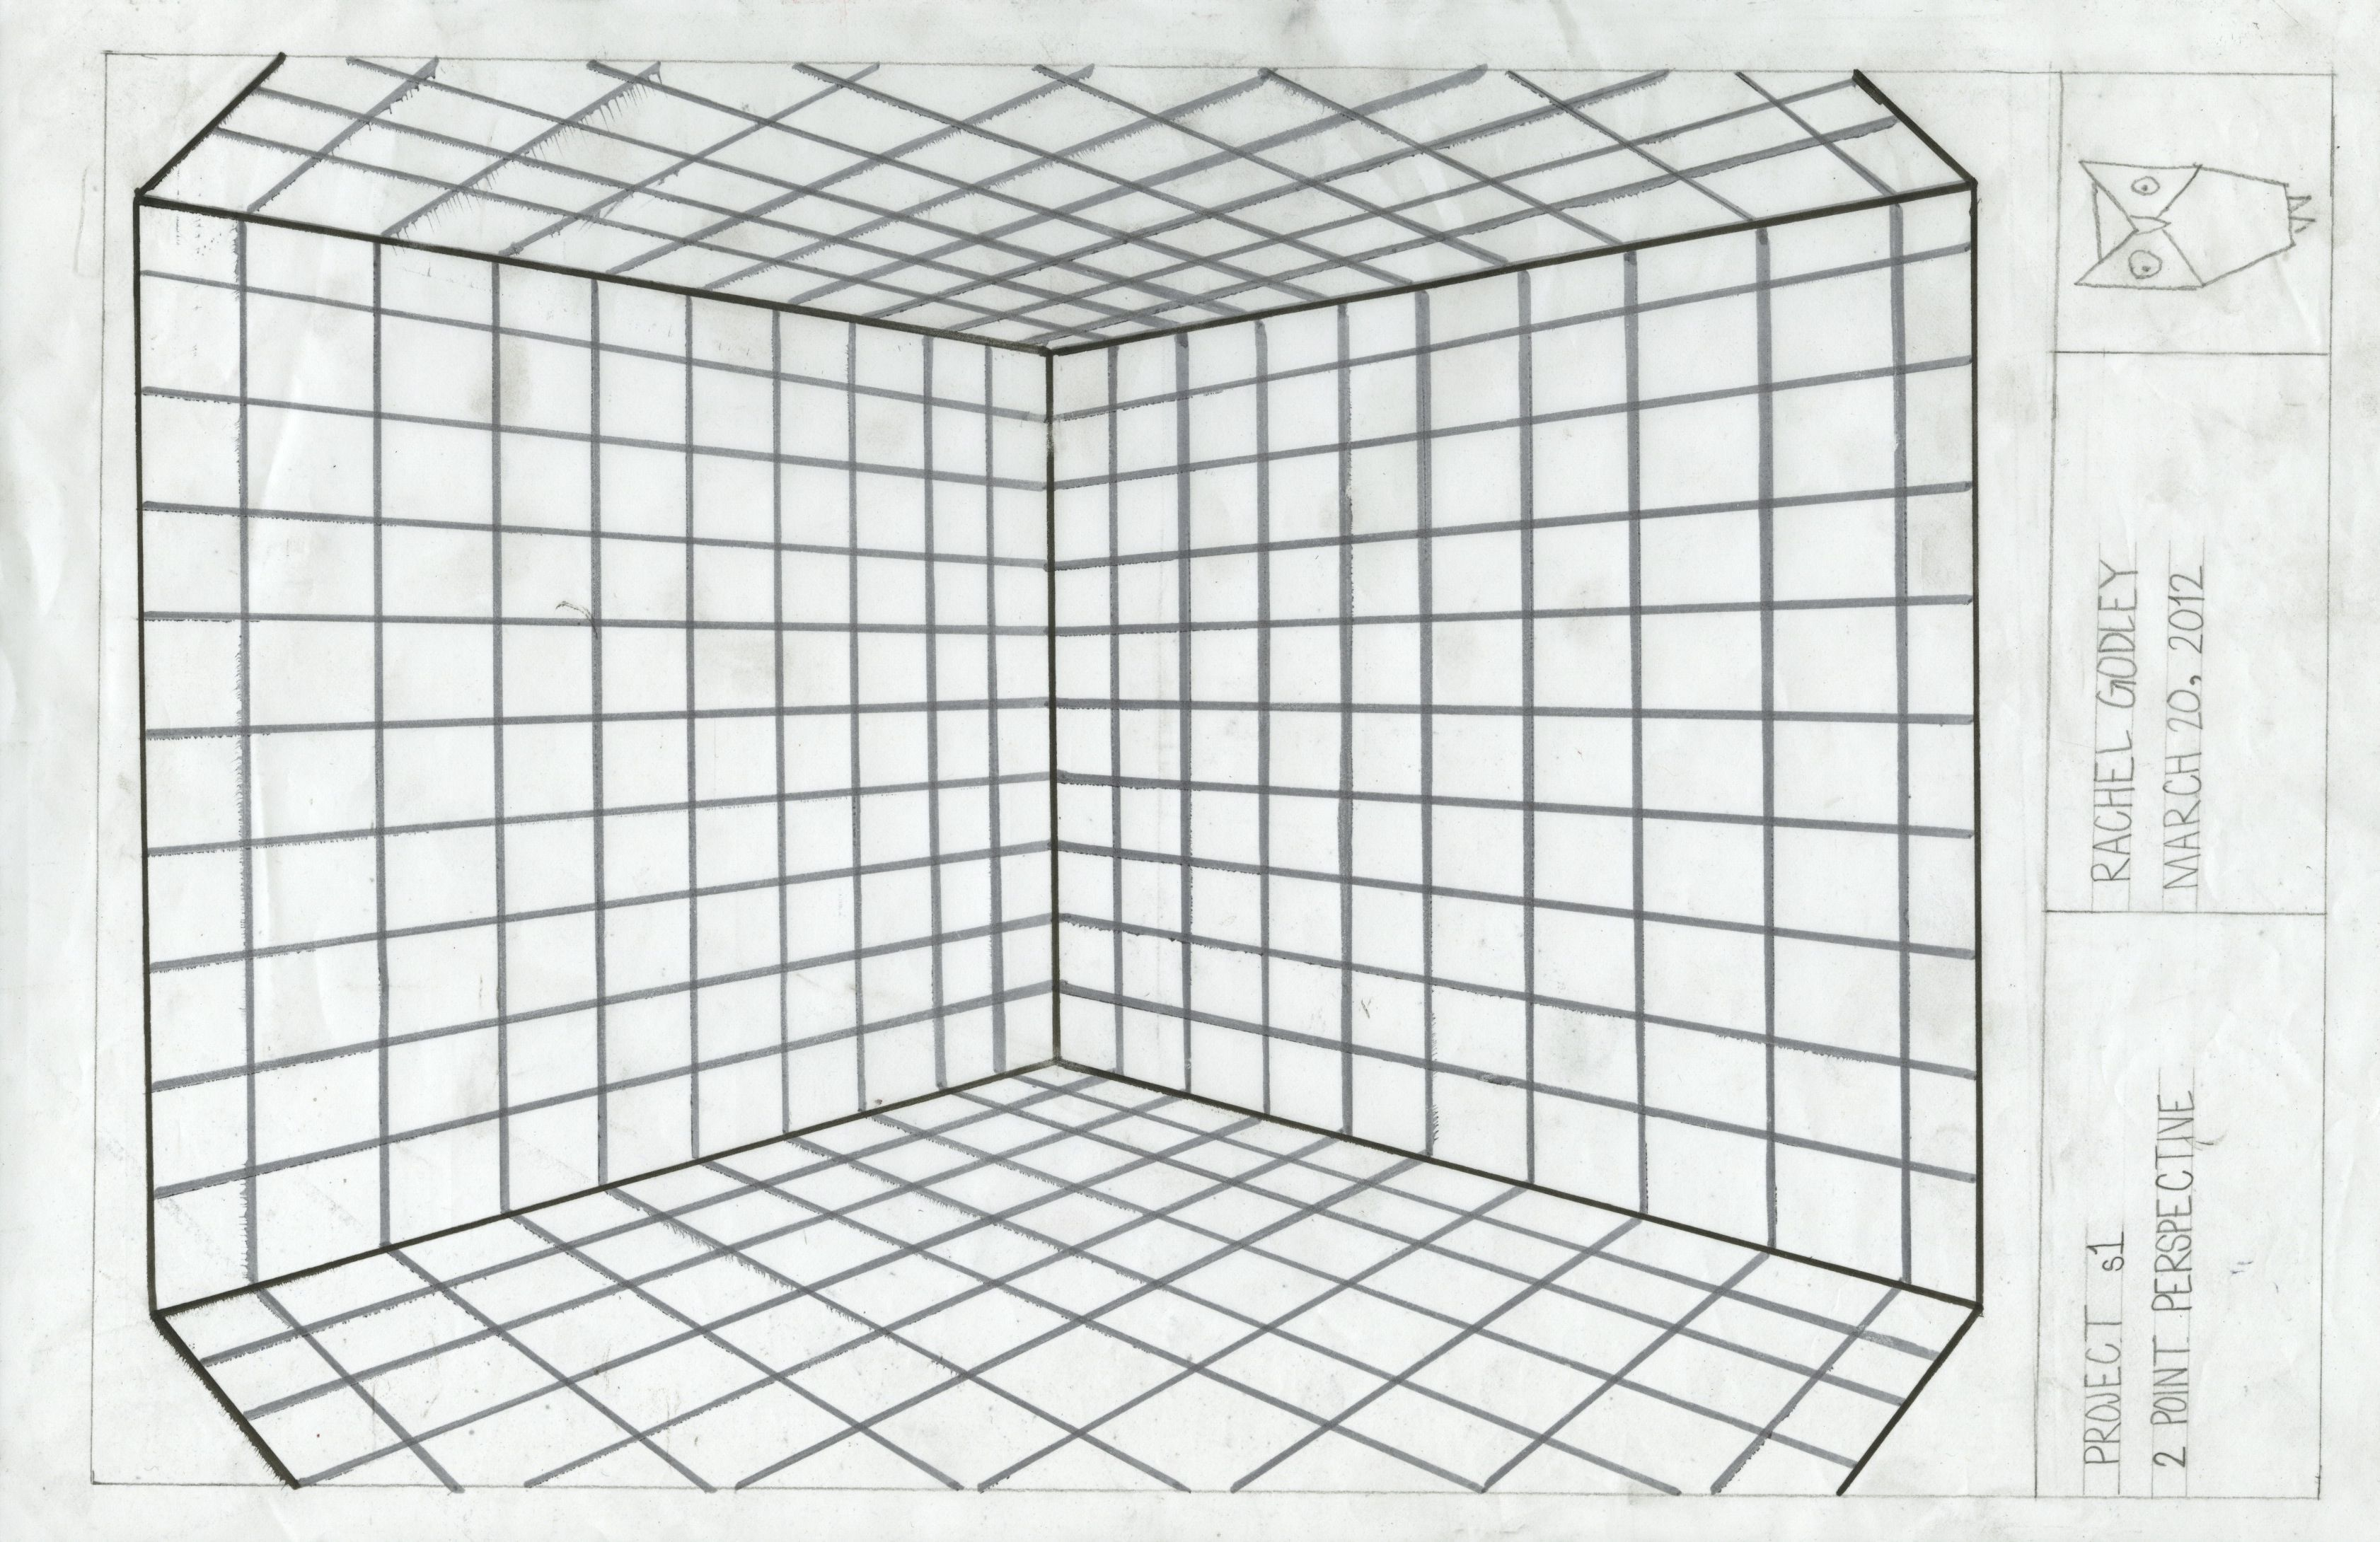 One Point Perspective One Point Perspective Art Education